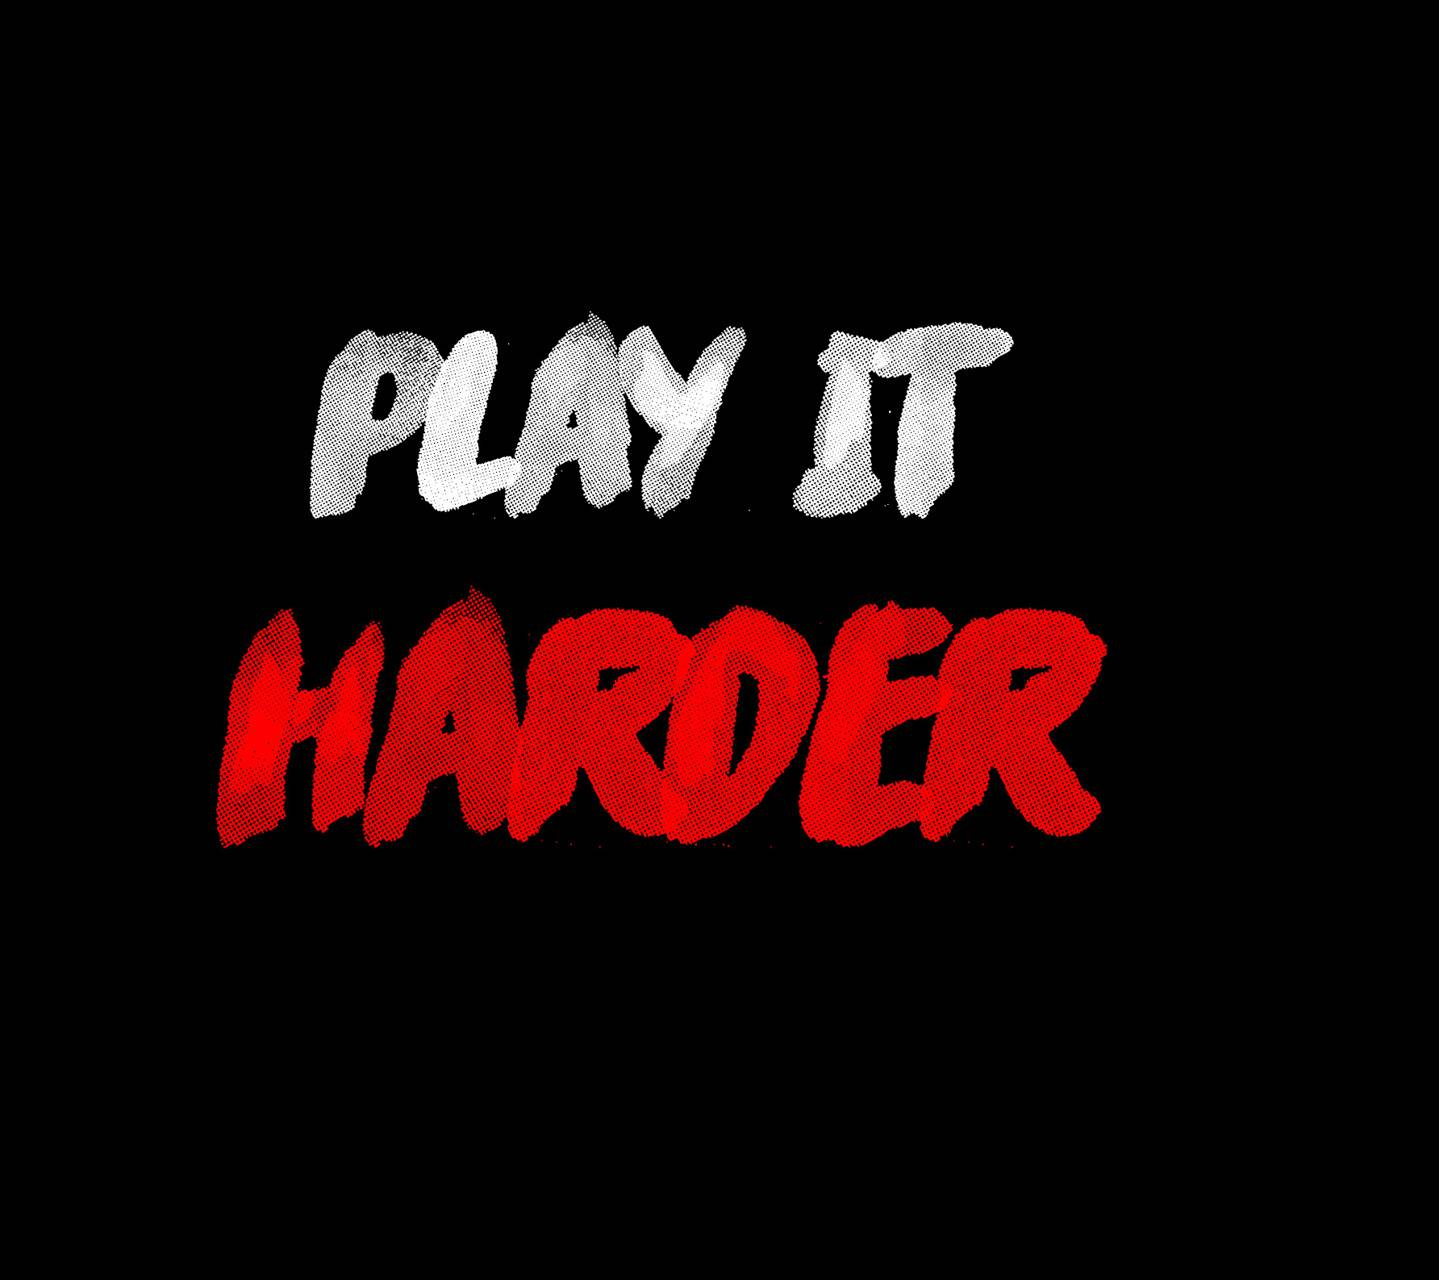 Play it HARDER